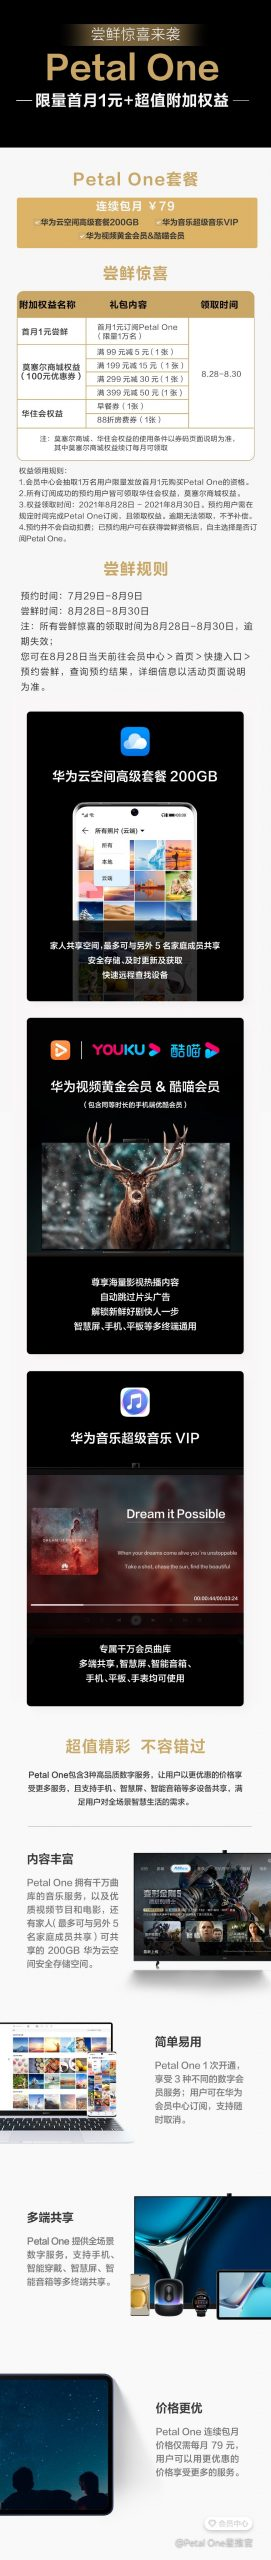 Huawei Petal One Membership